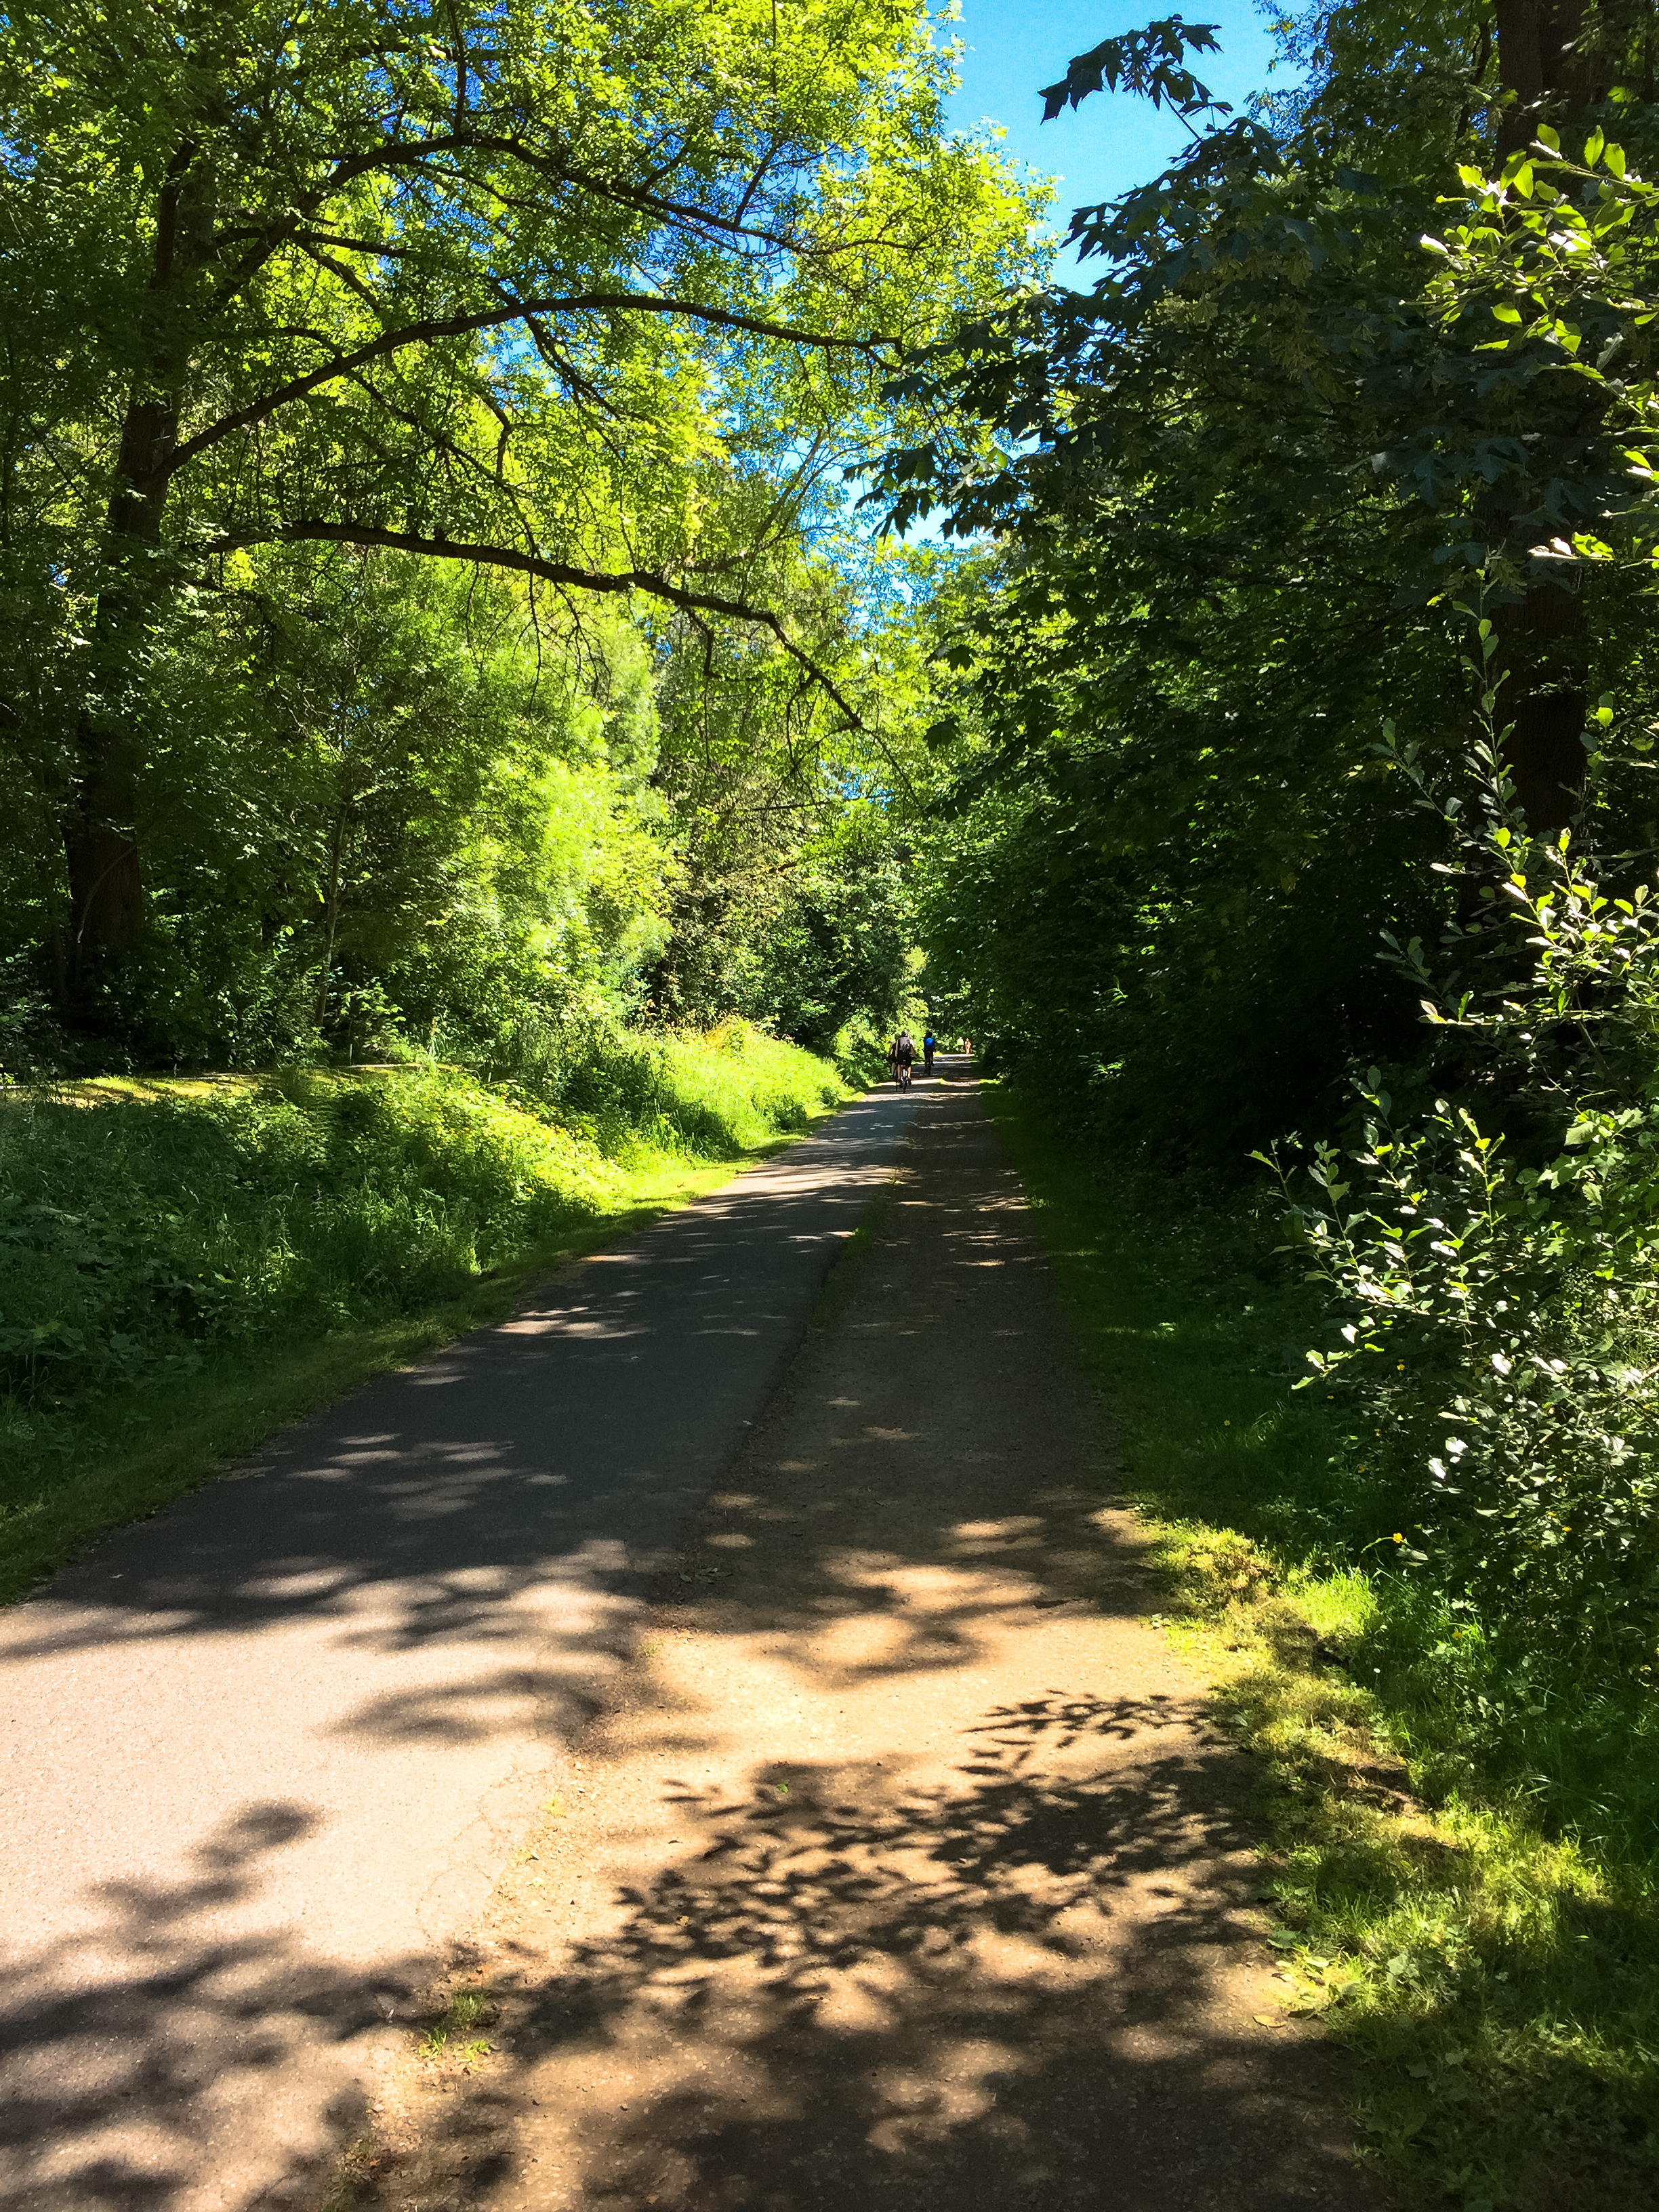 Biking the Burke-Gilman Trail